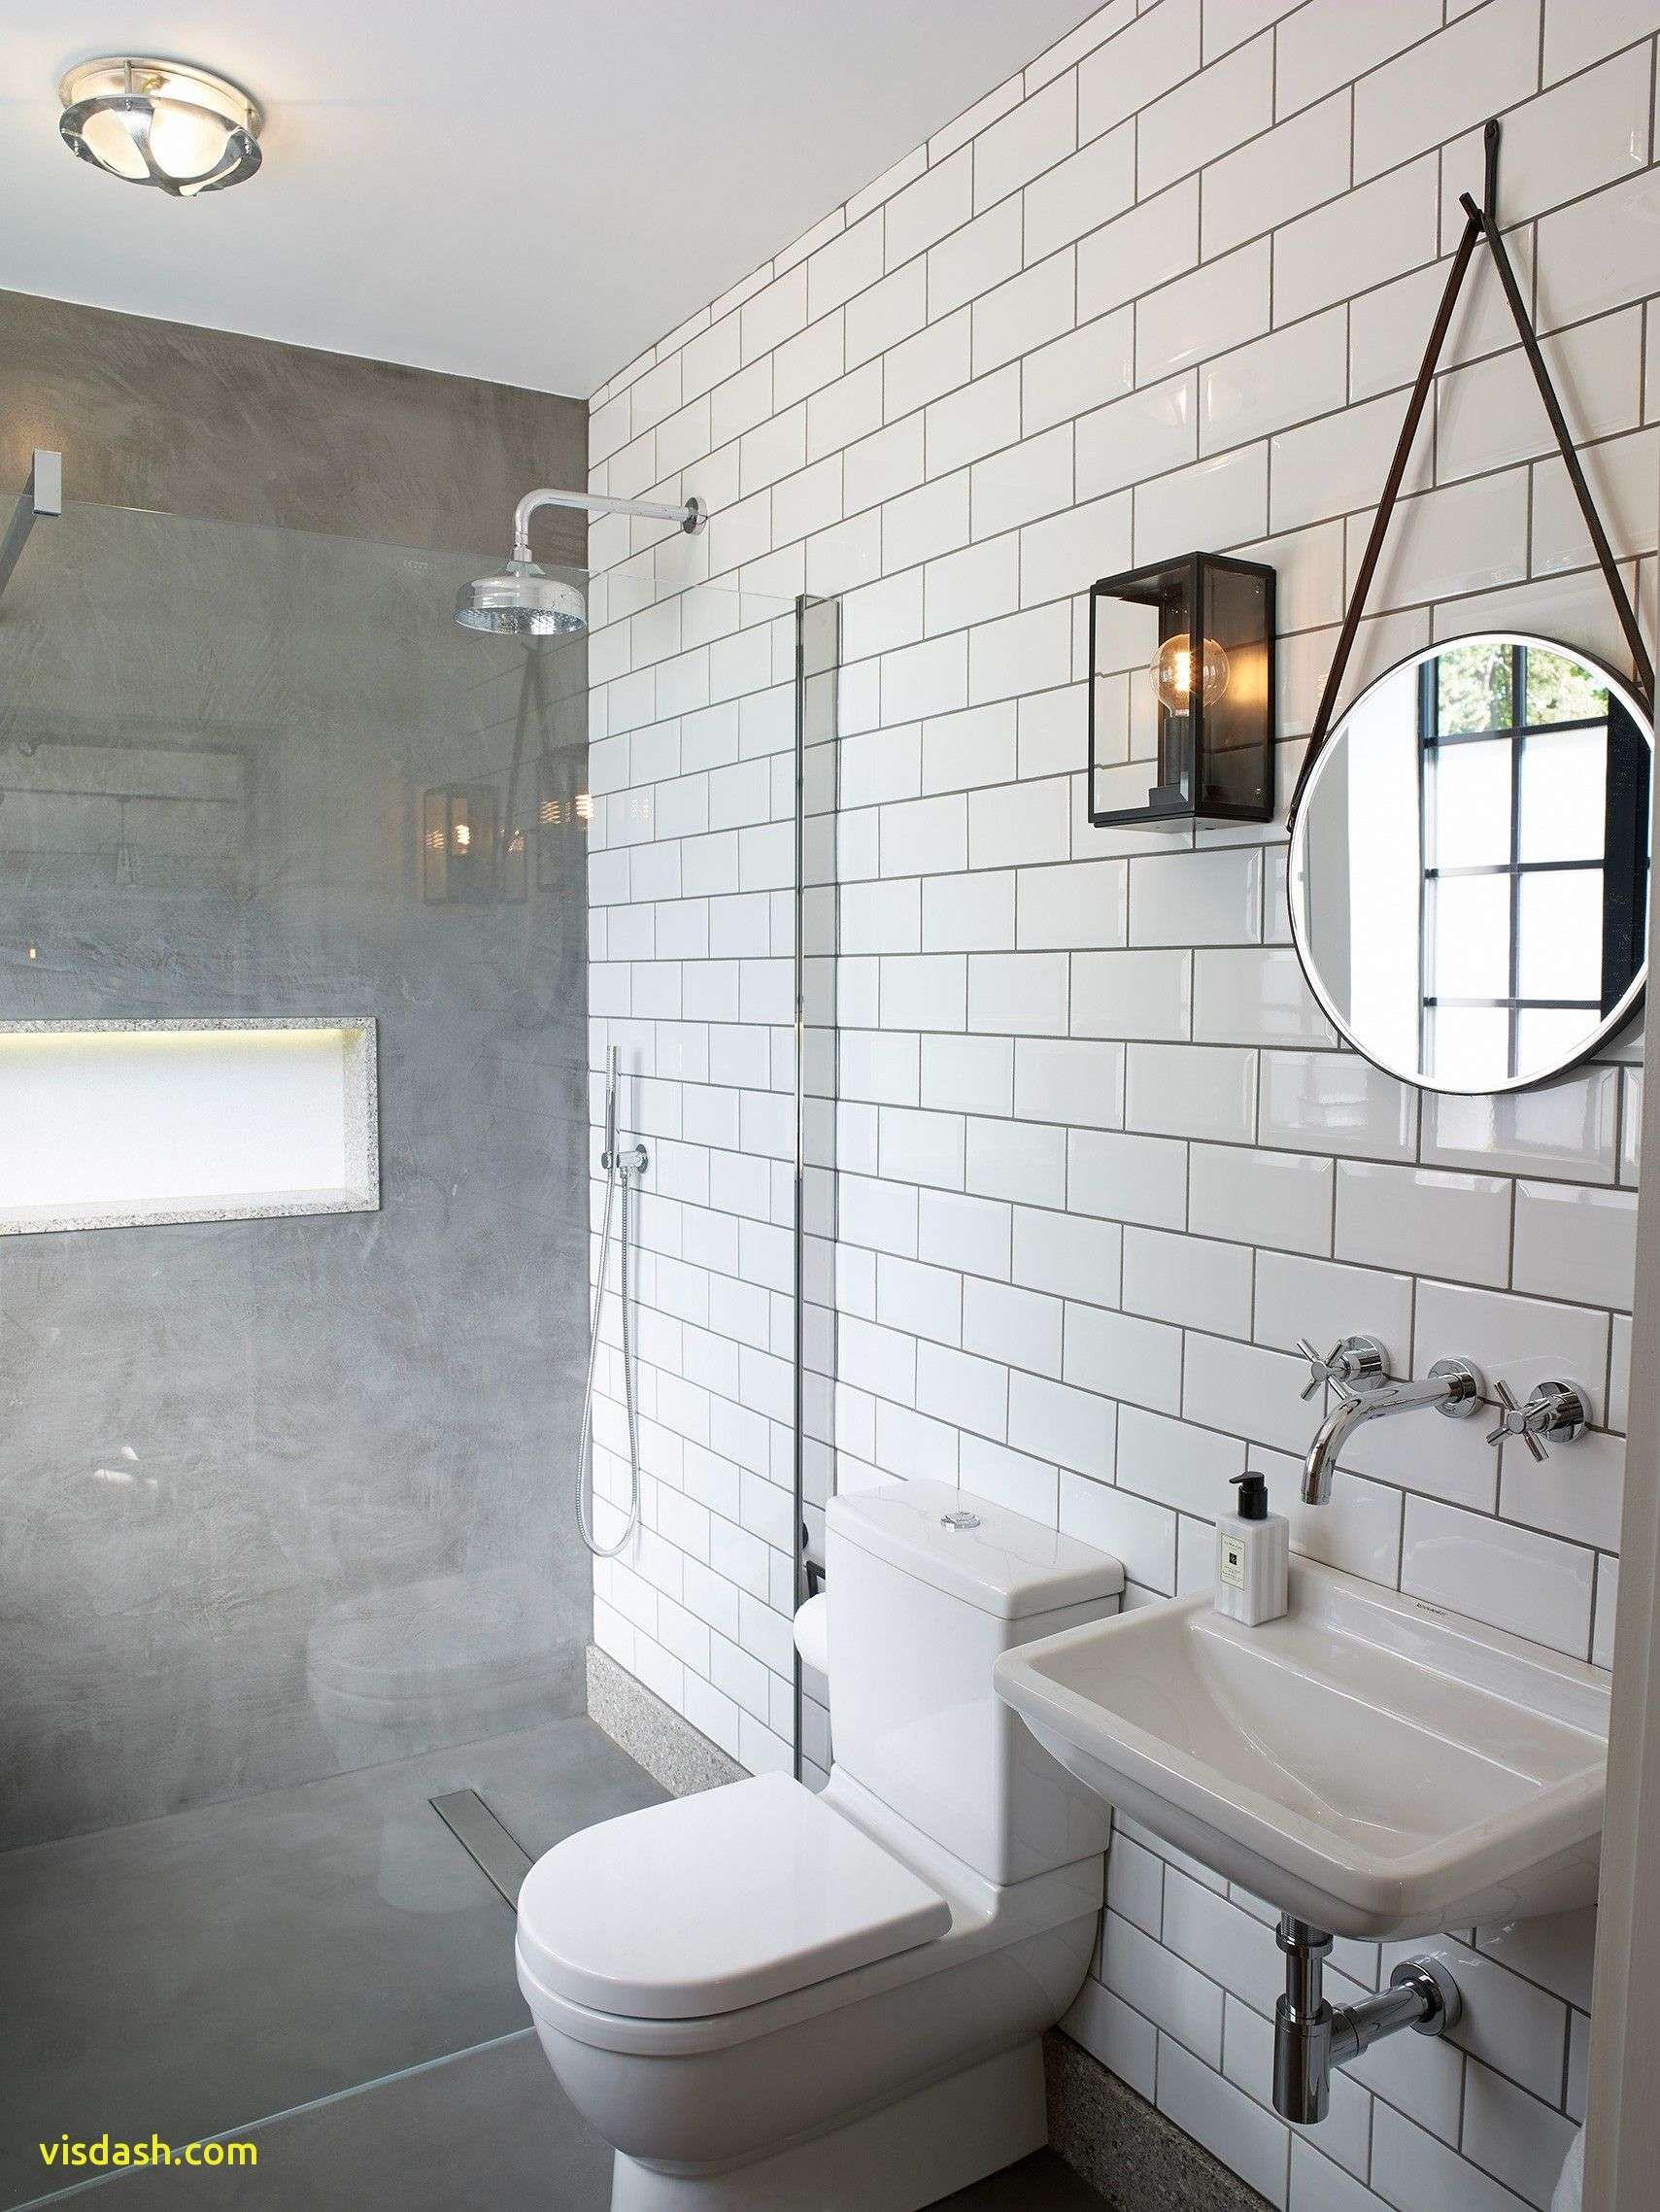 bathroom design kendal  Tile bathroom, Bathroom tile designs